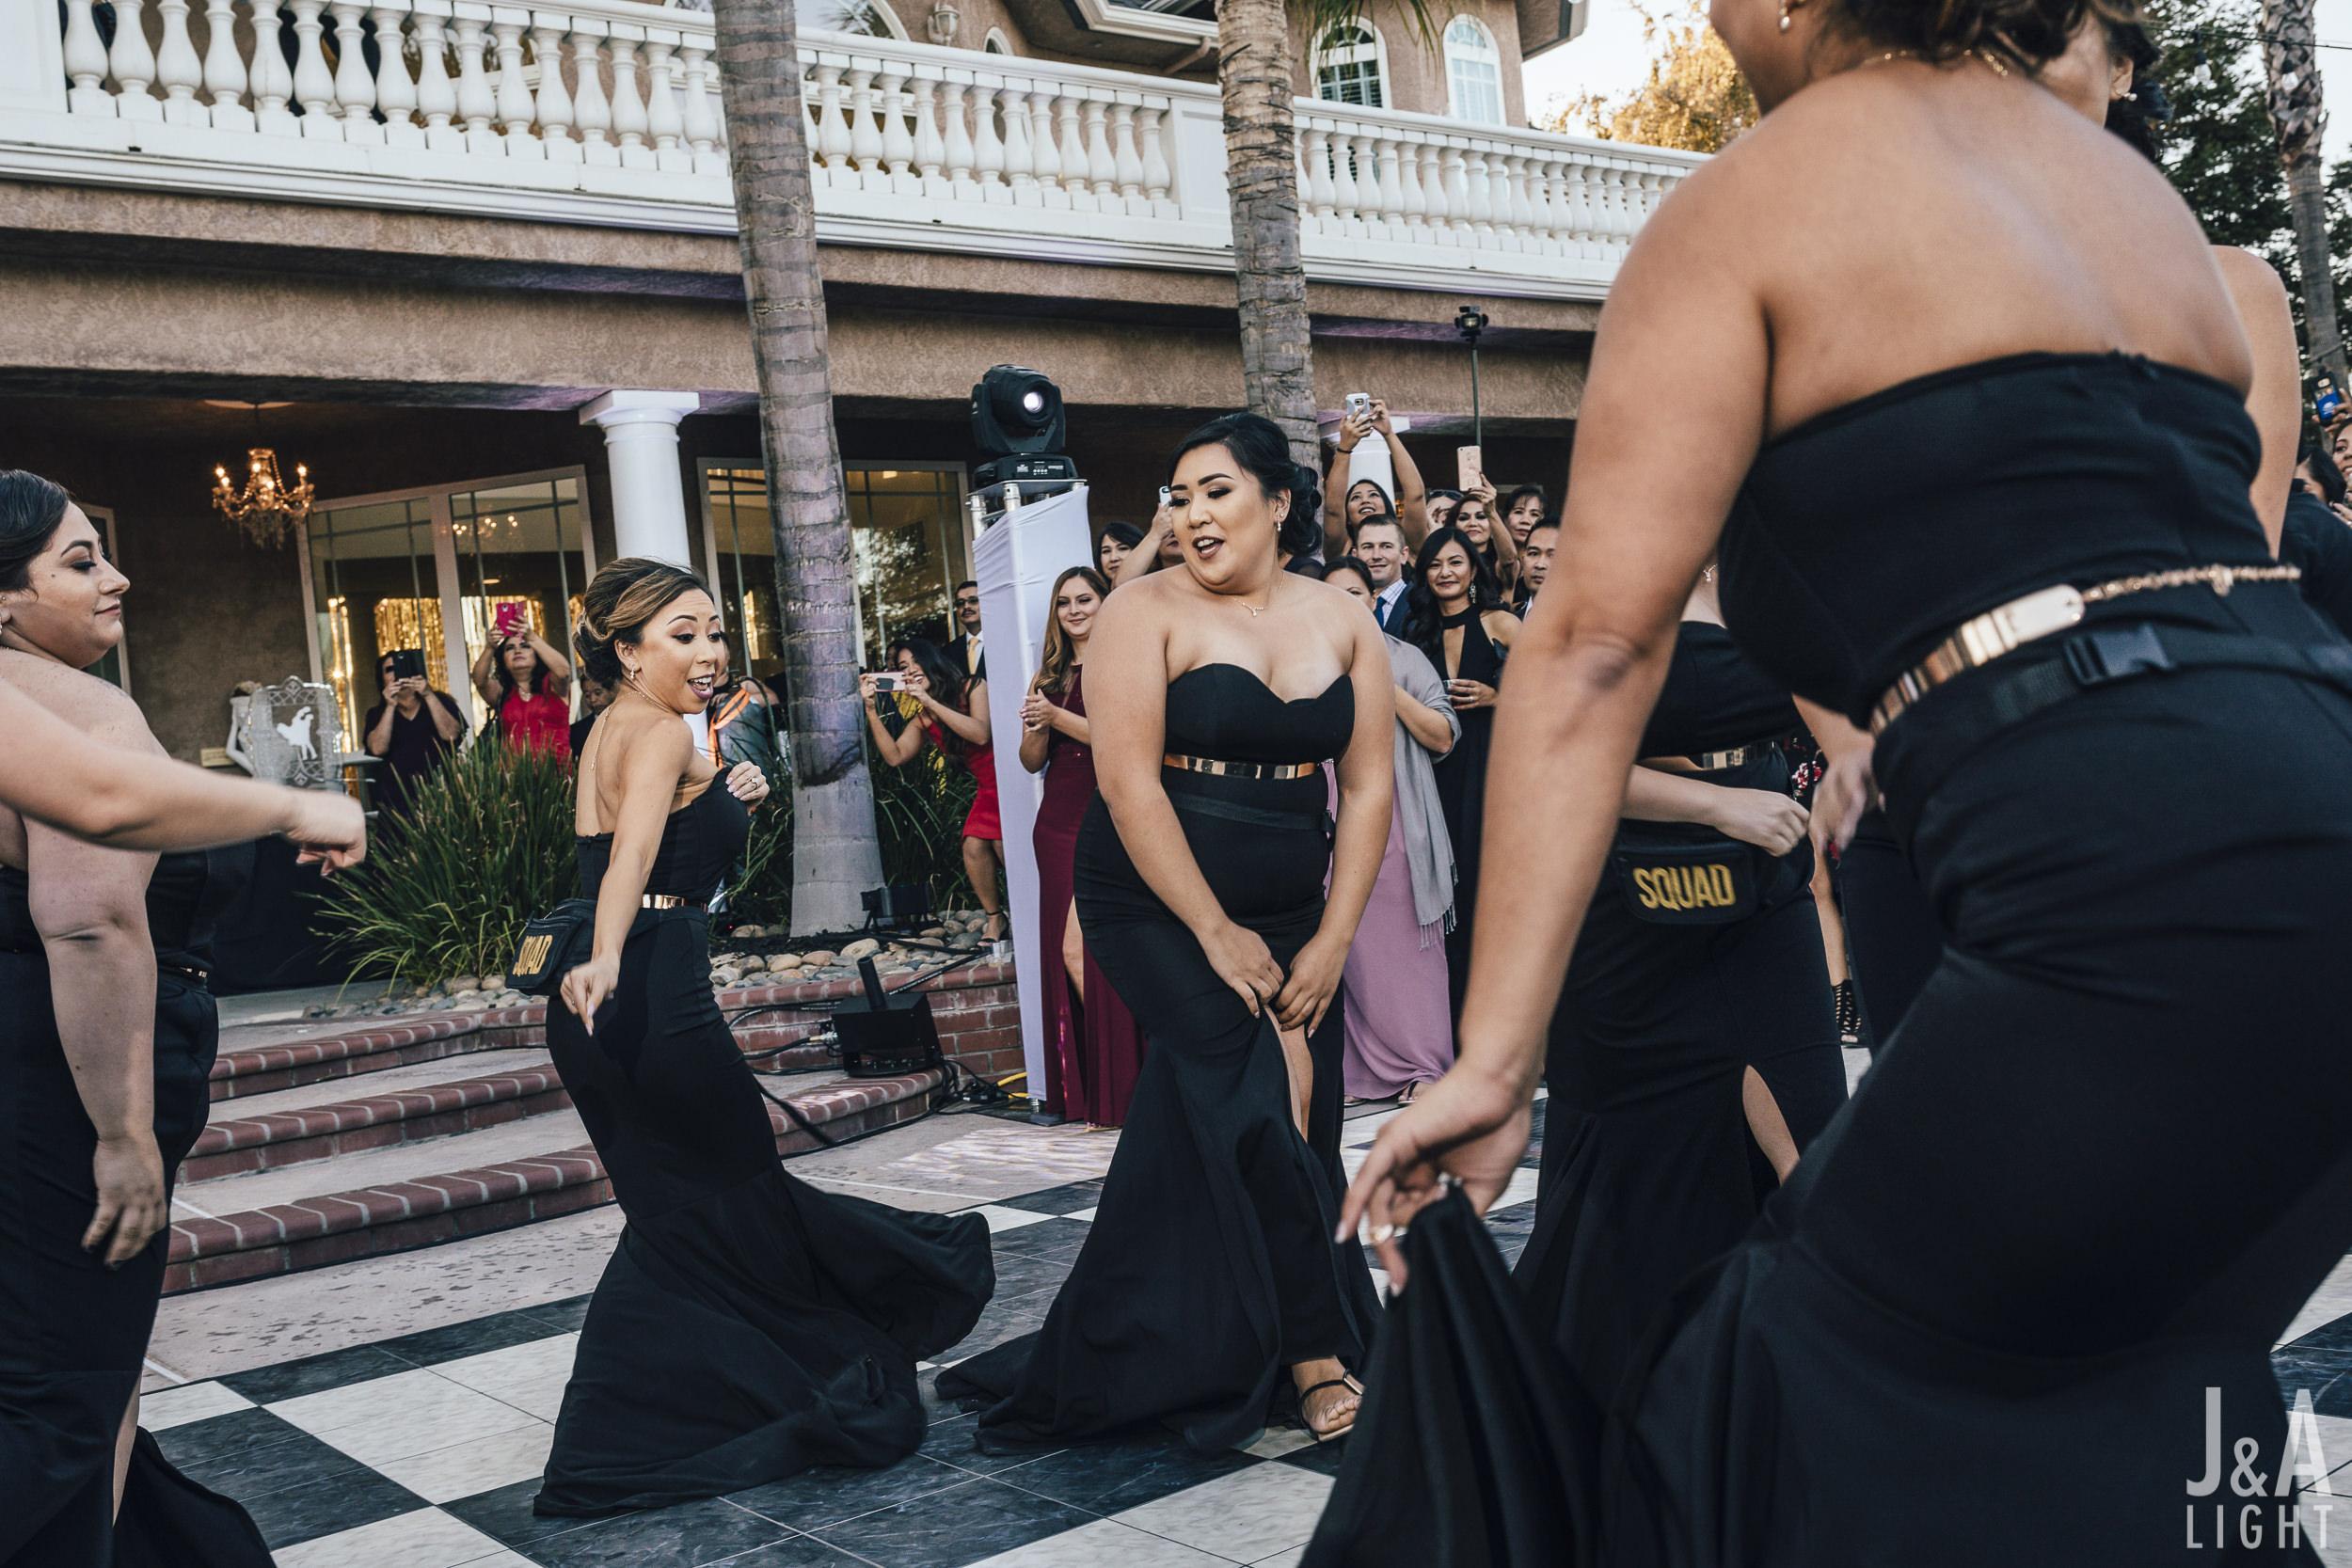 20171014-JanDan-LosBanos-GlassMansion-Wedding-Blog-055.jpg